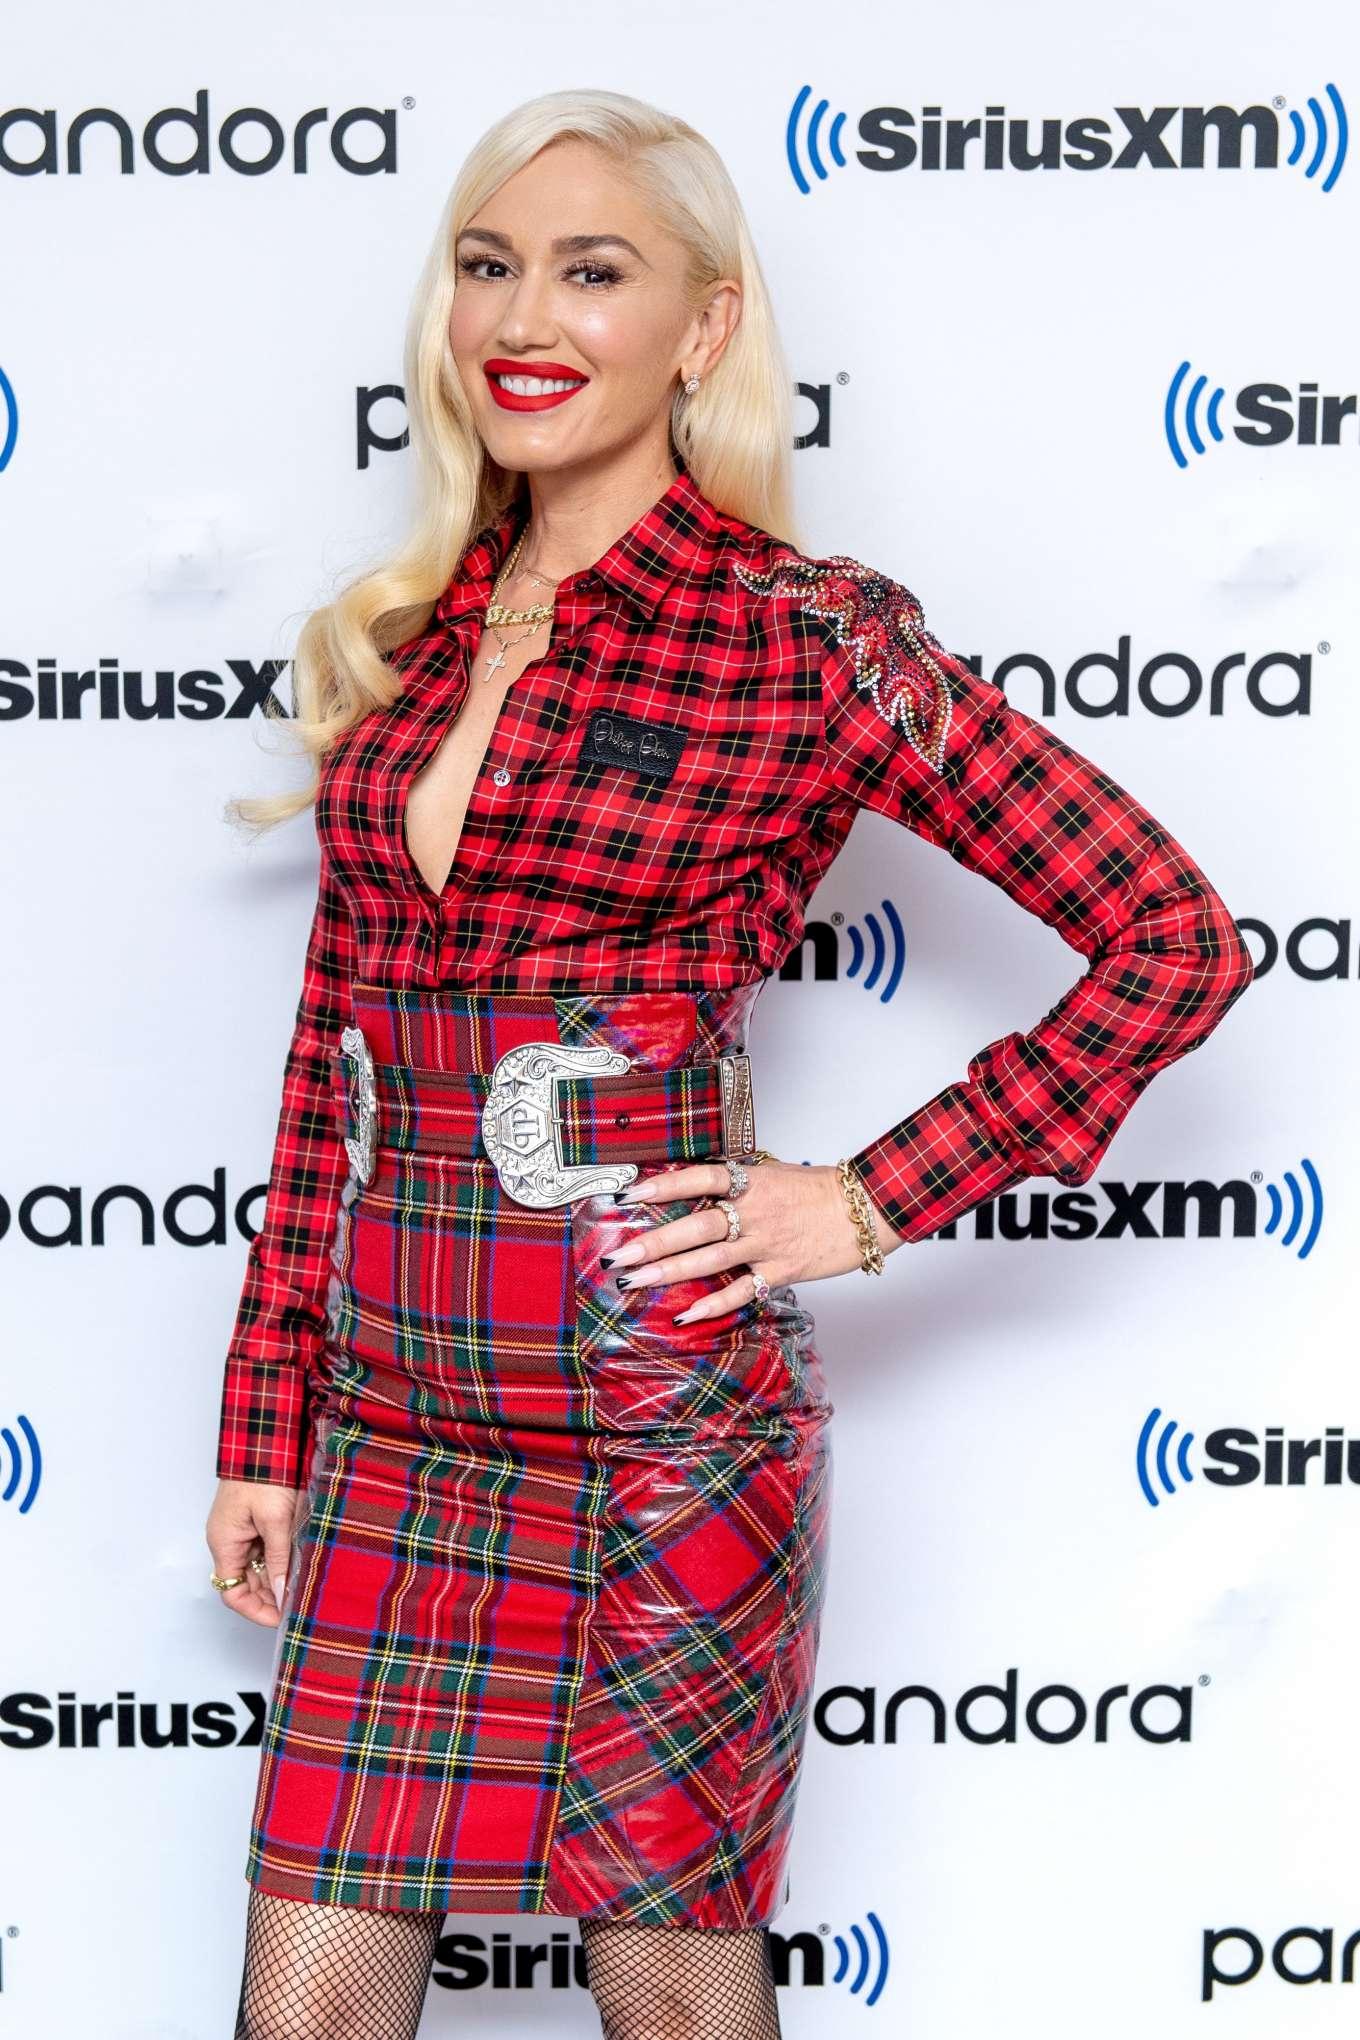 Gwen Stefani - Visits The SiriusXM Studios in New York City